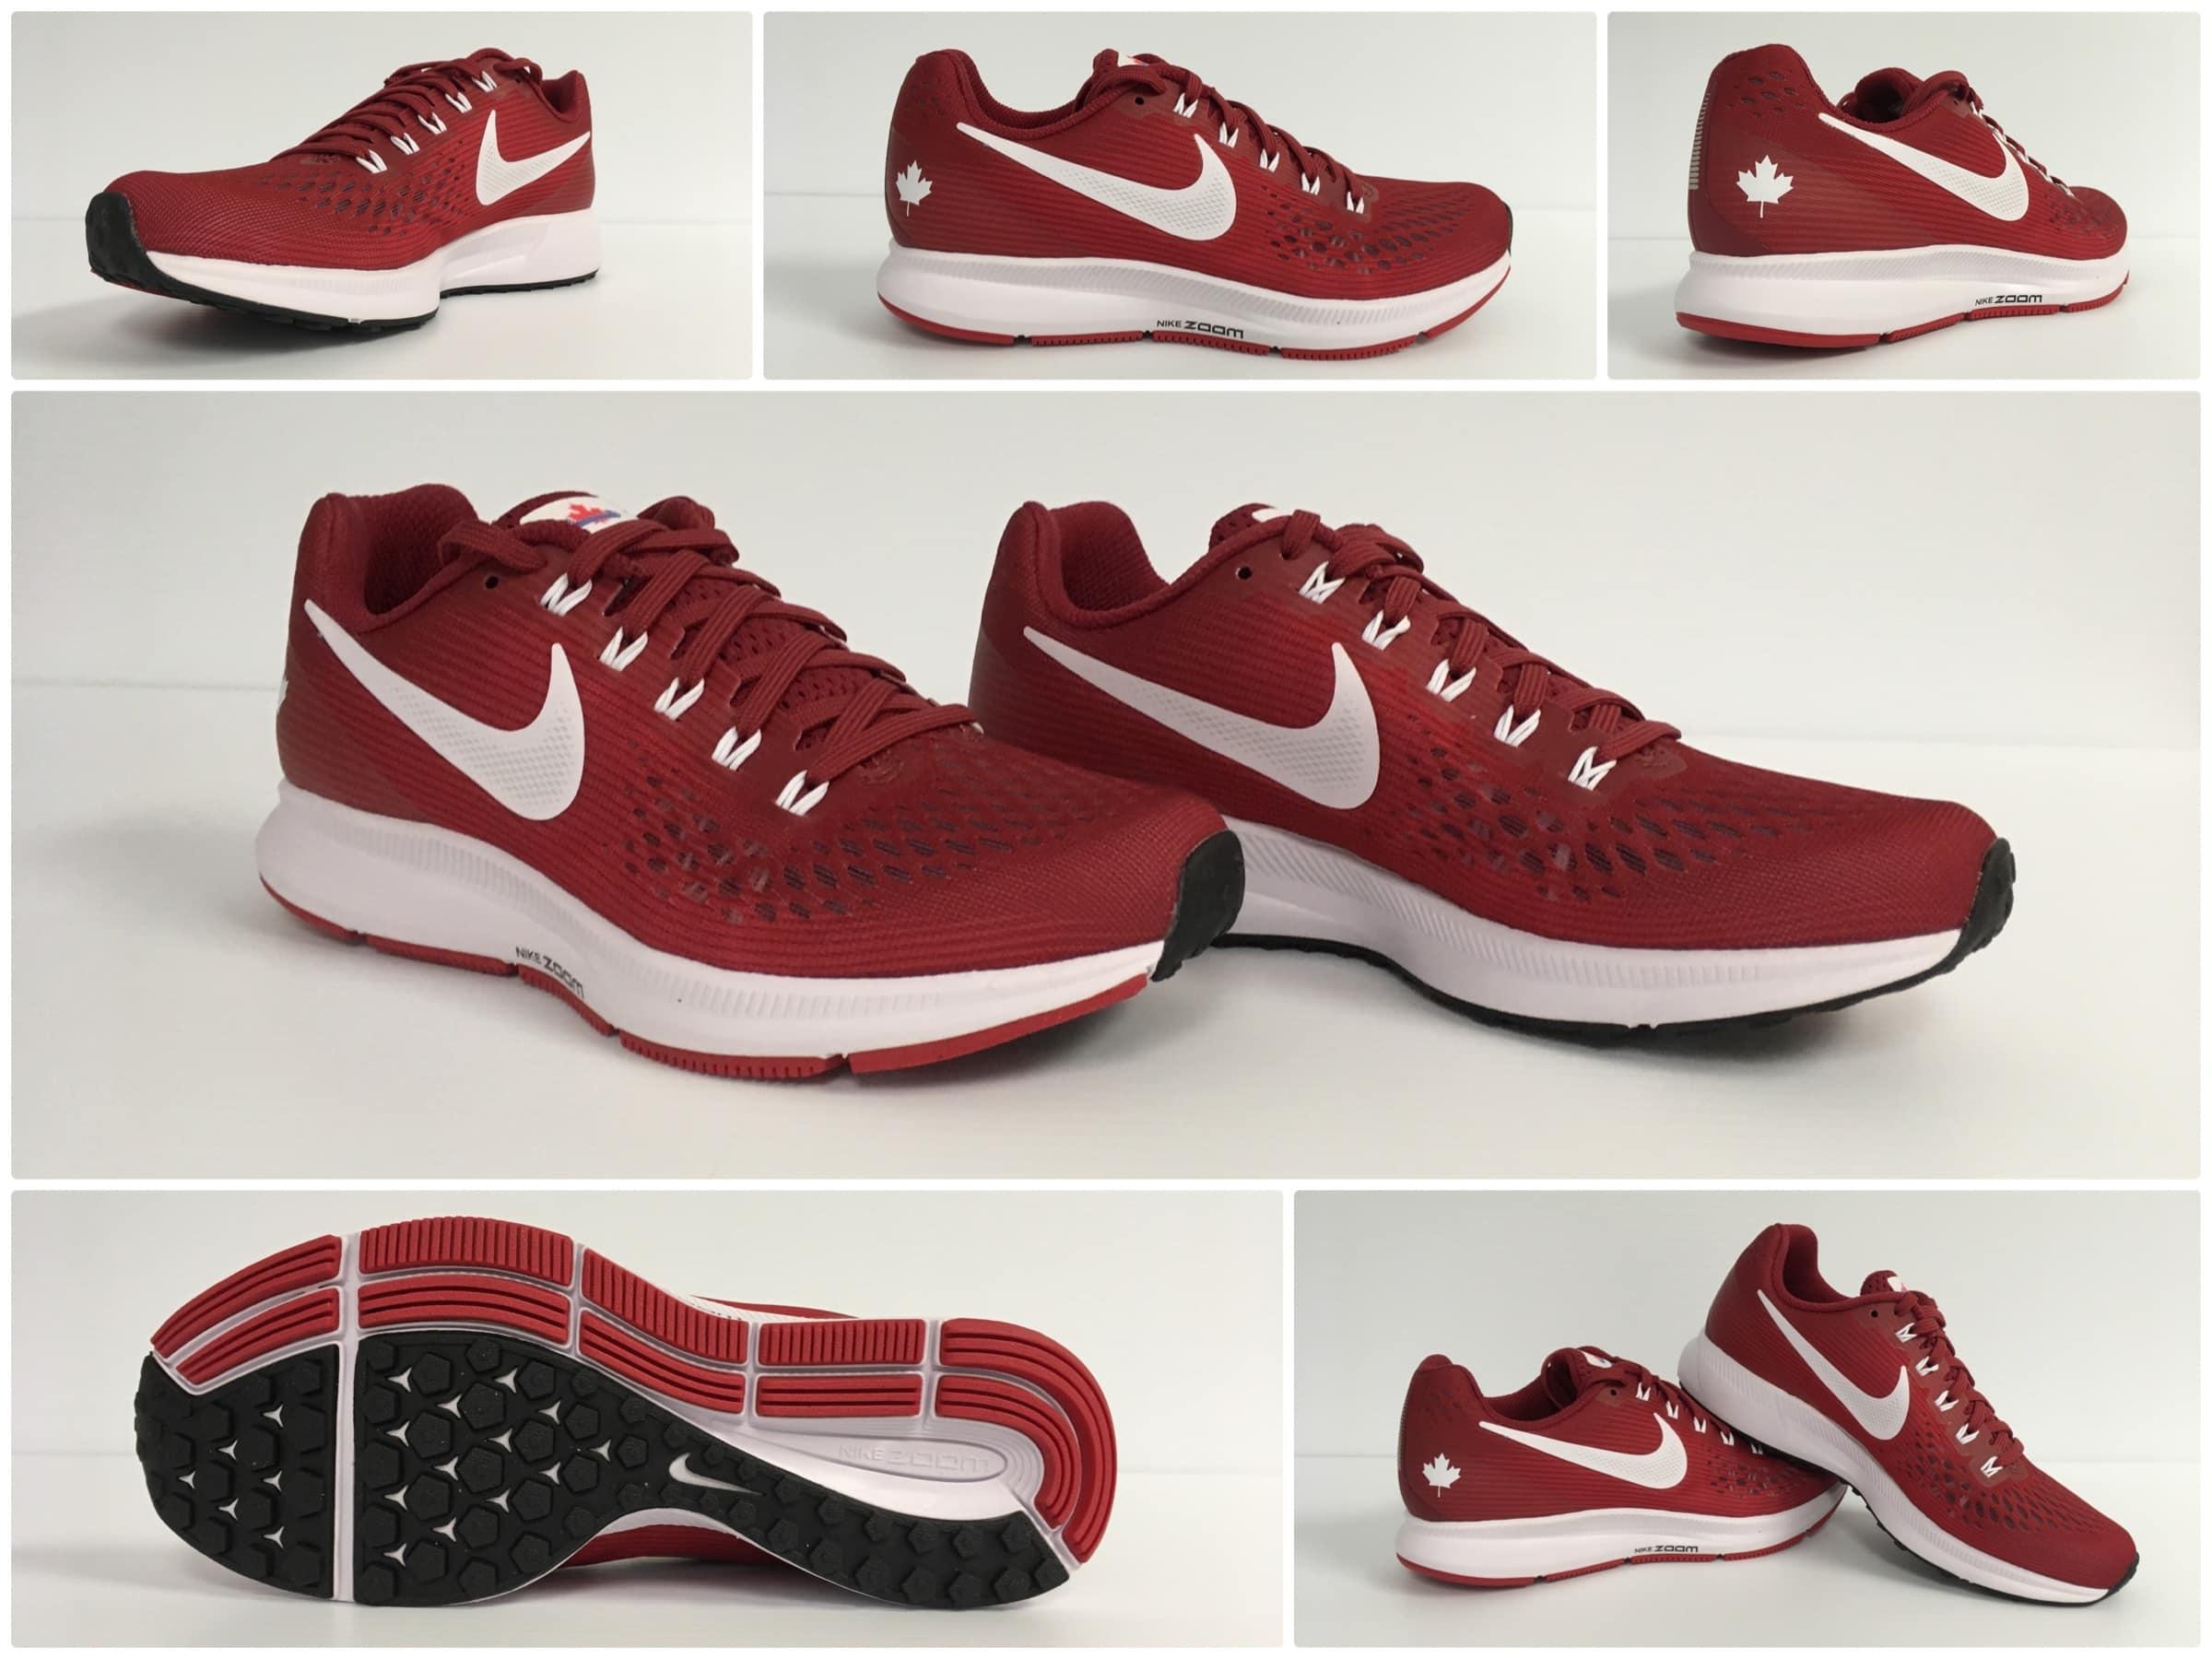 uk availability d923a 0c4c7 Nike ACTF Air Zoom Pegasus 34 | Athletics Canada